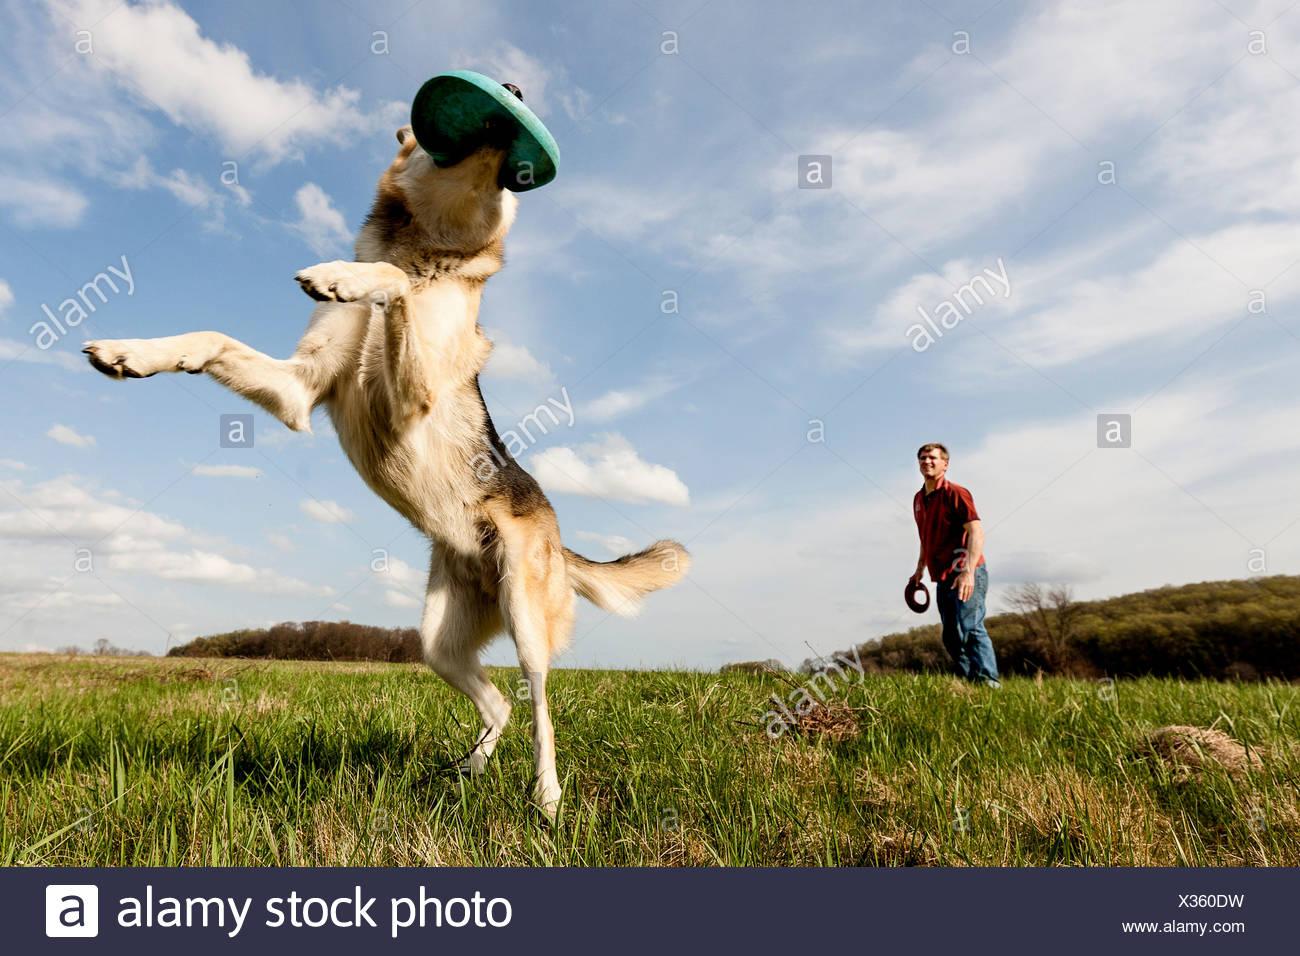 Alsatian dog catching frisbee - Stock Image